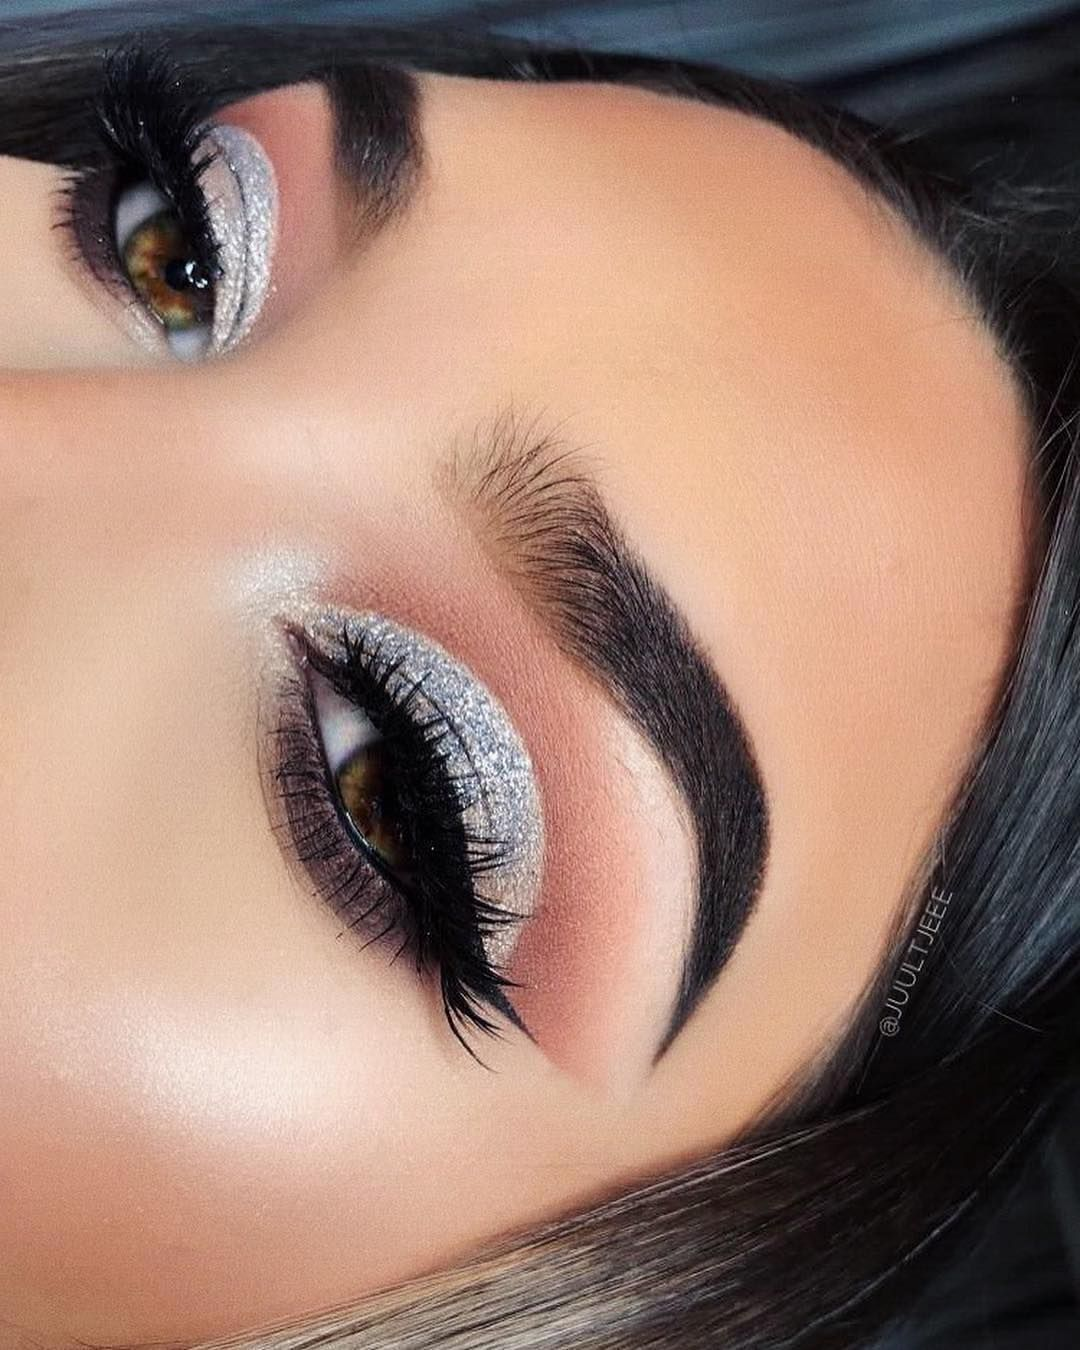 Gorgeous eye makeup - eye shadow ,gold eye makeup ,eye makeup for brown eyes ,  ,#abh,eyeshadow #eyemakeup #sexyeyes #makeup #eyemakeupideas